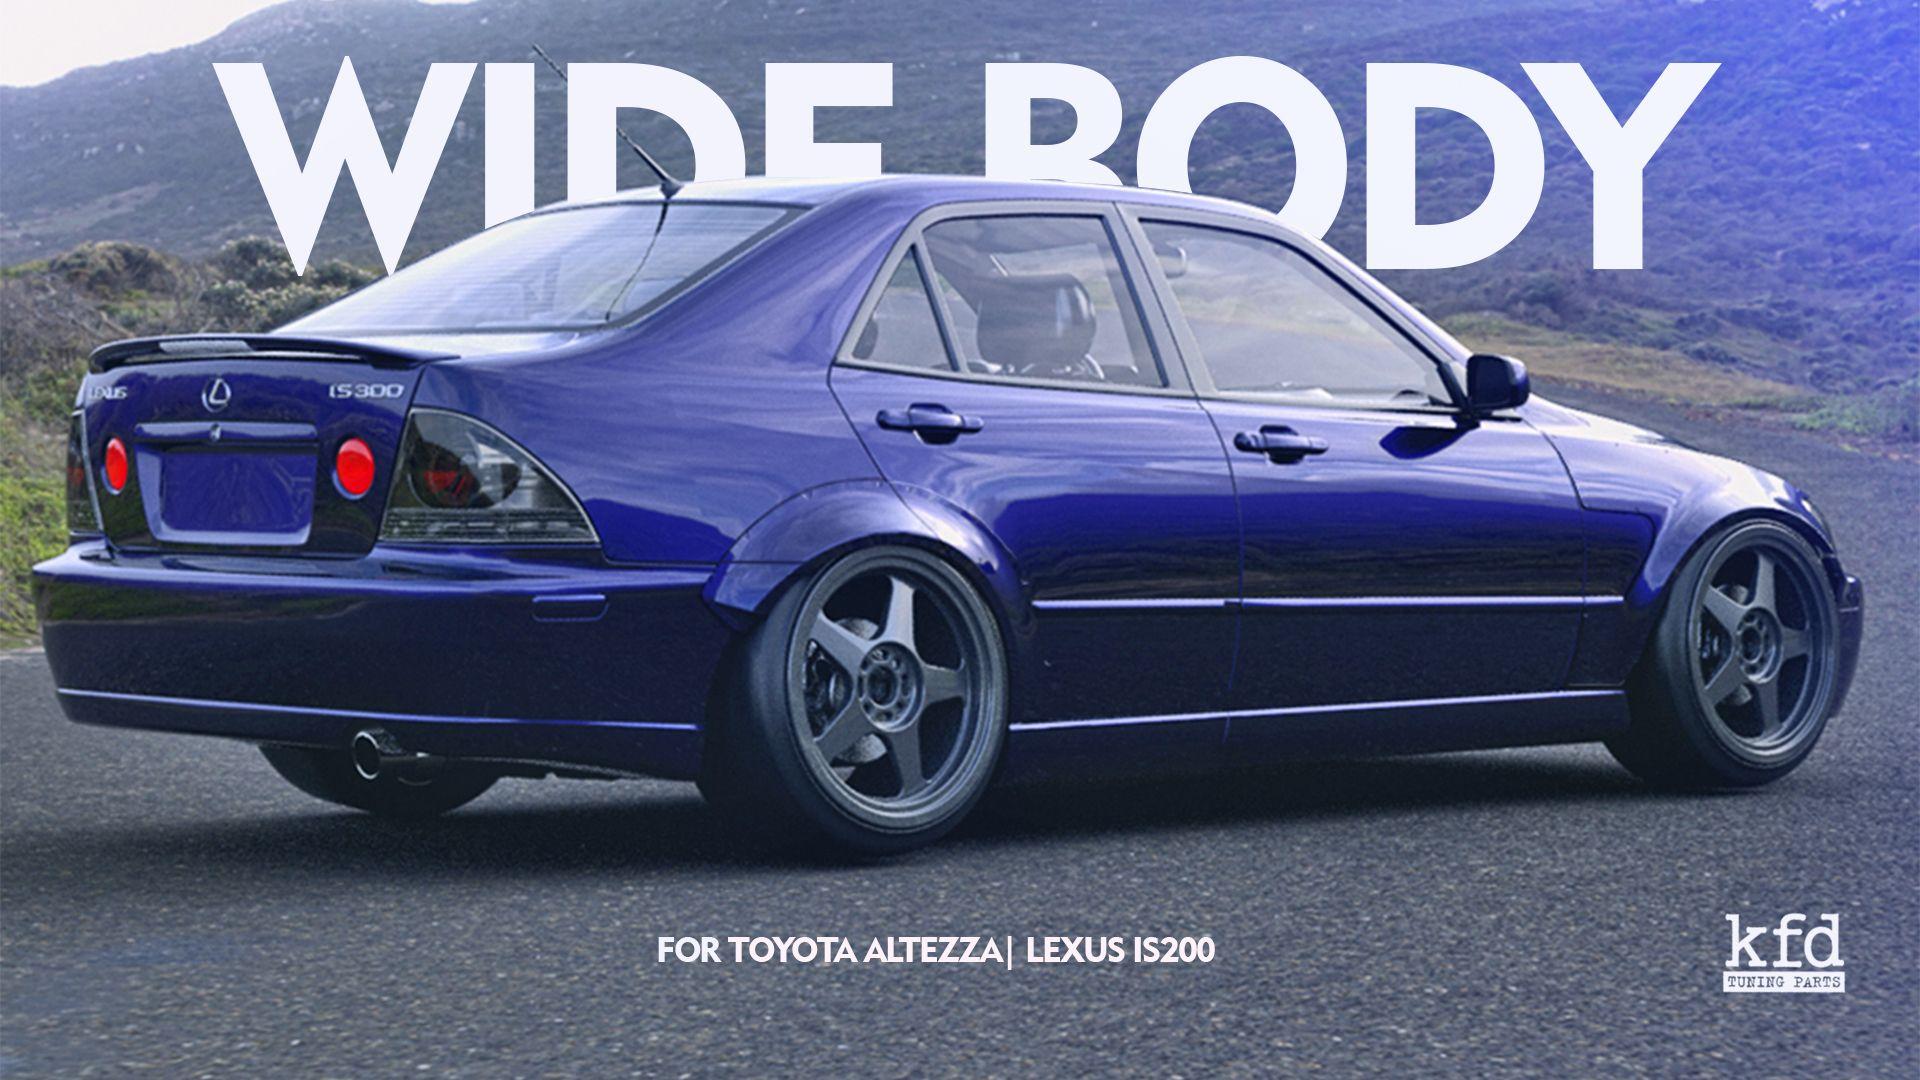 Wide Body For Toyota Altezza Lexus Is200 Is300 Lexus Is300 Lexus Lexus Cars